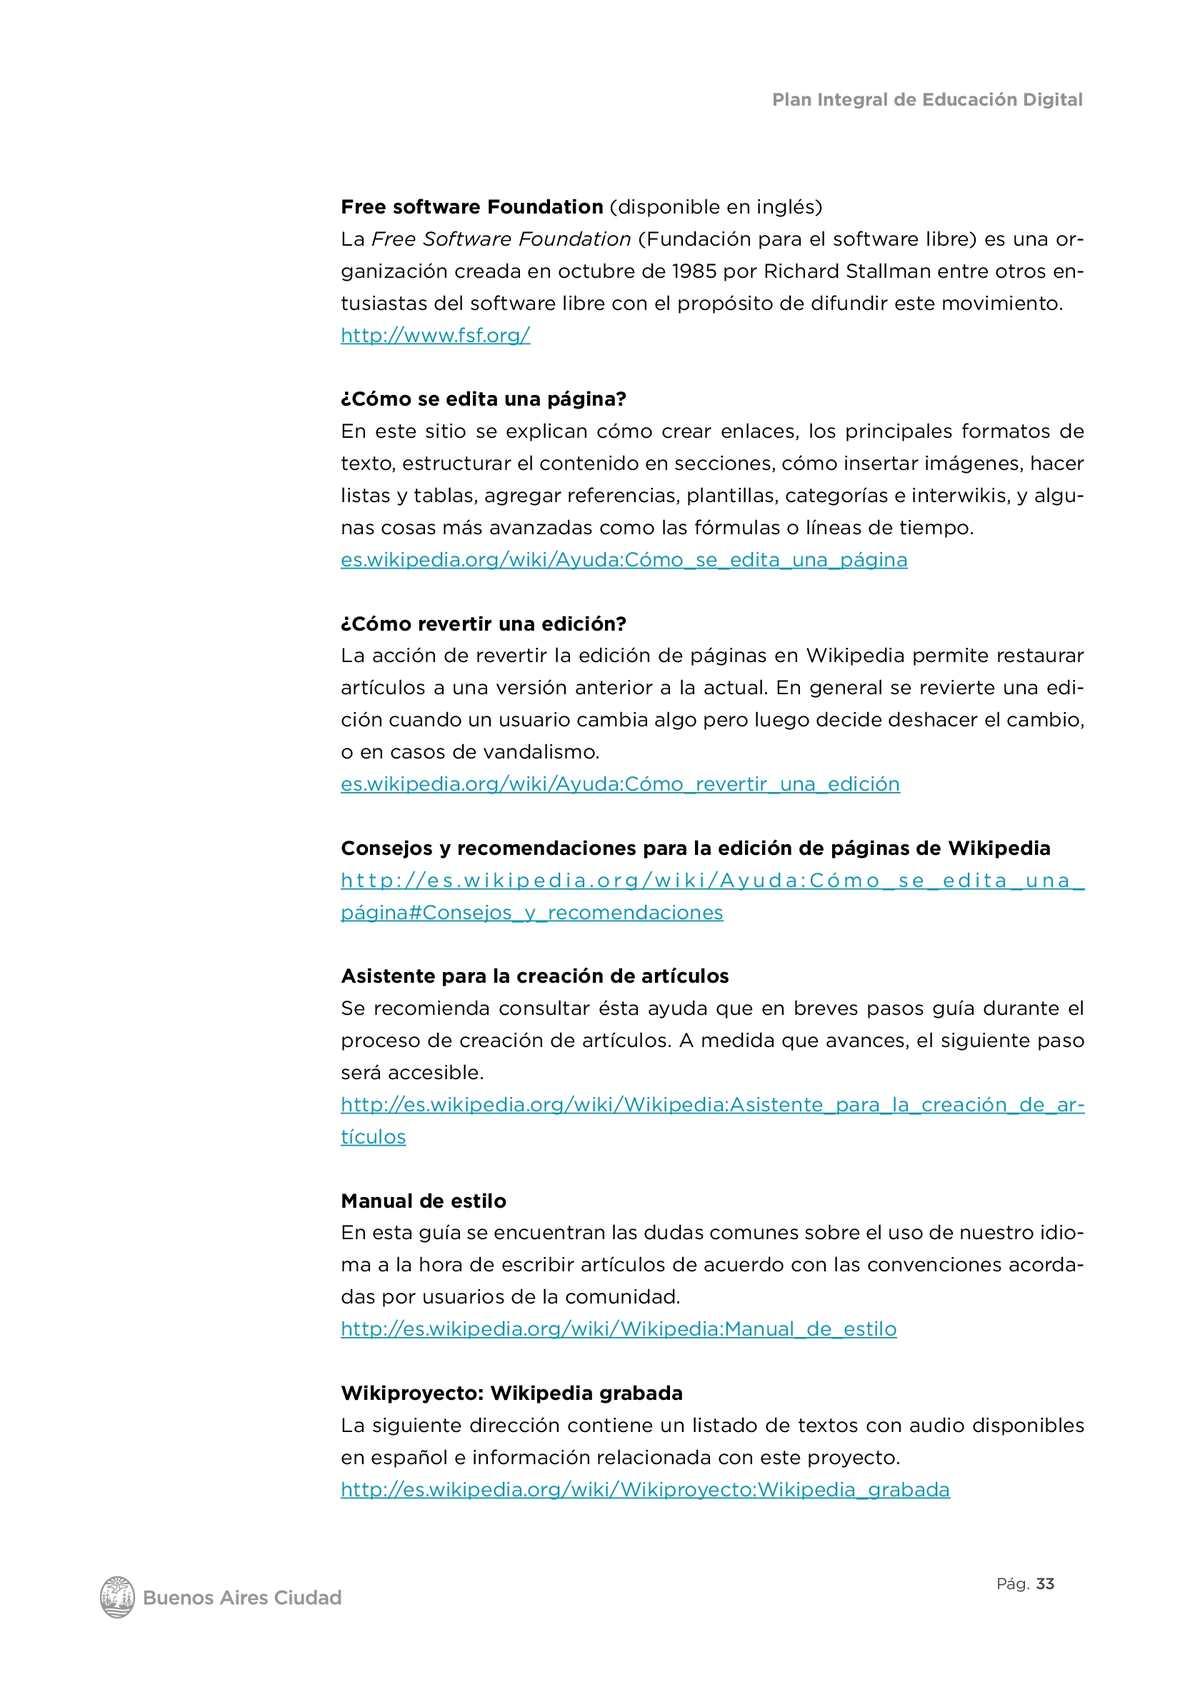 Tutorial Wikipedia - CALAMEO Downloader